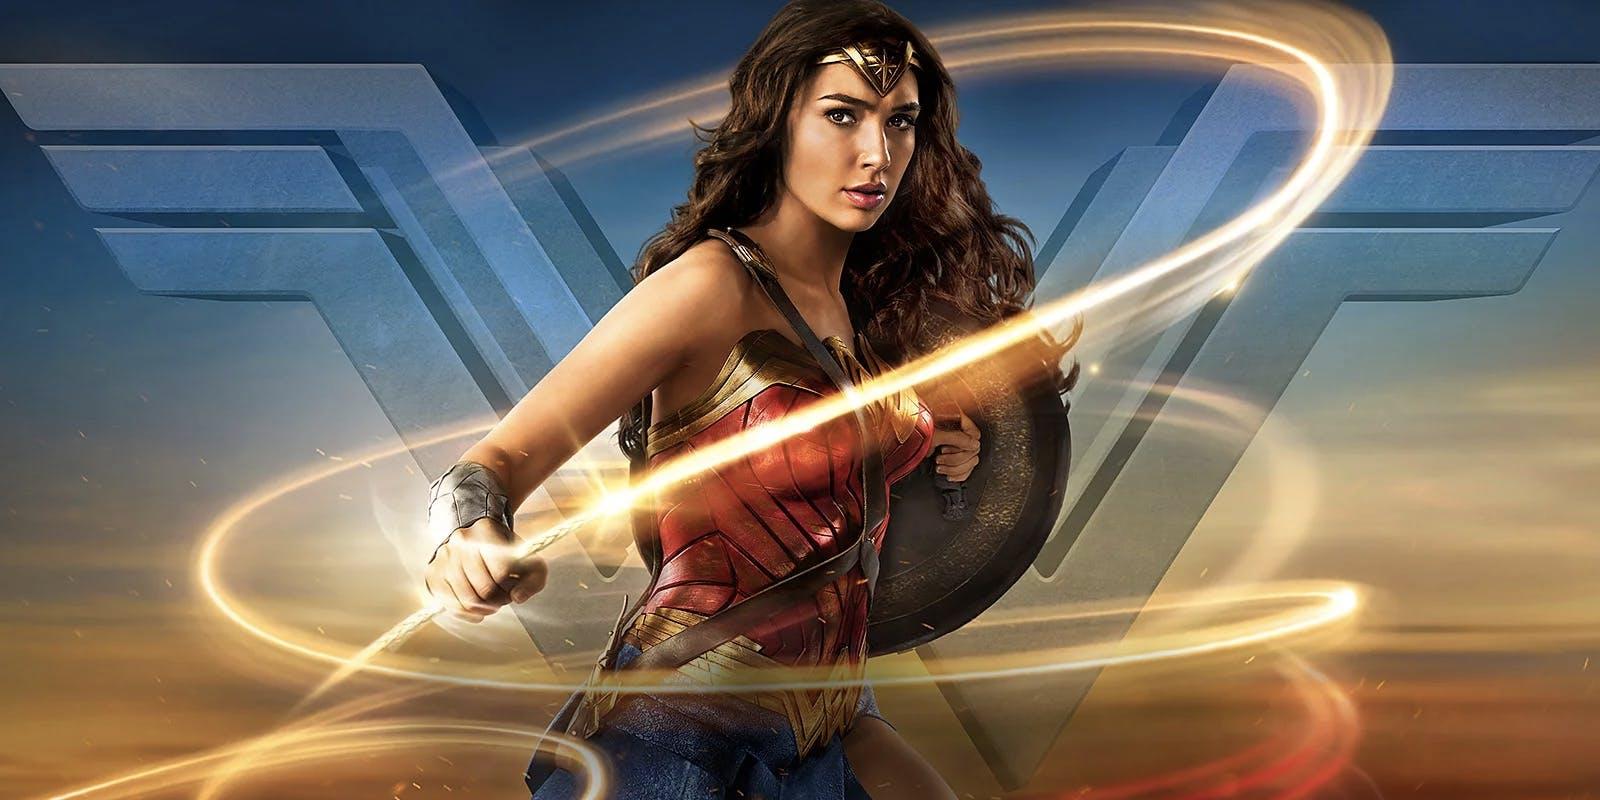 """Wonder Woman 1984"" Pushed Back Seven Months"